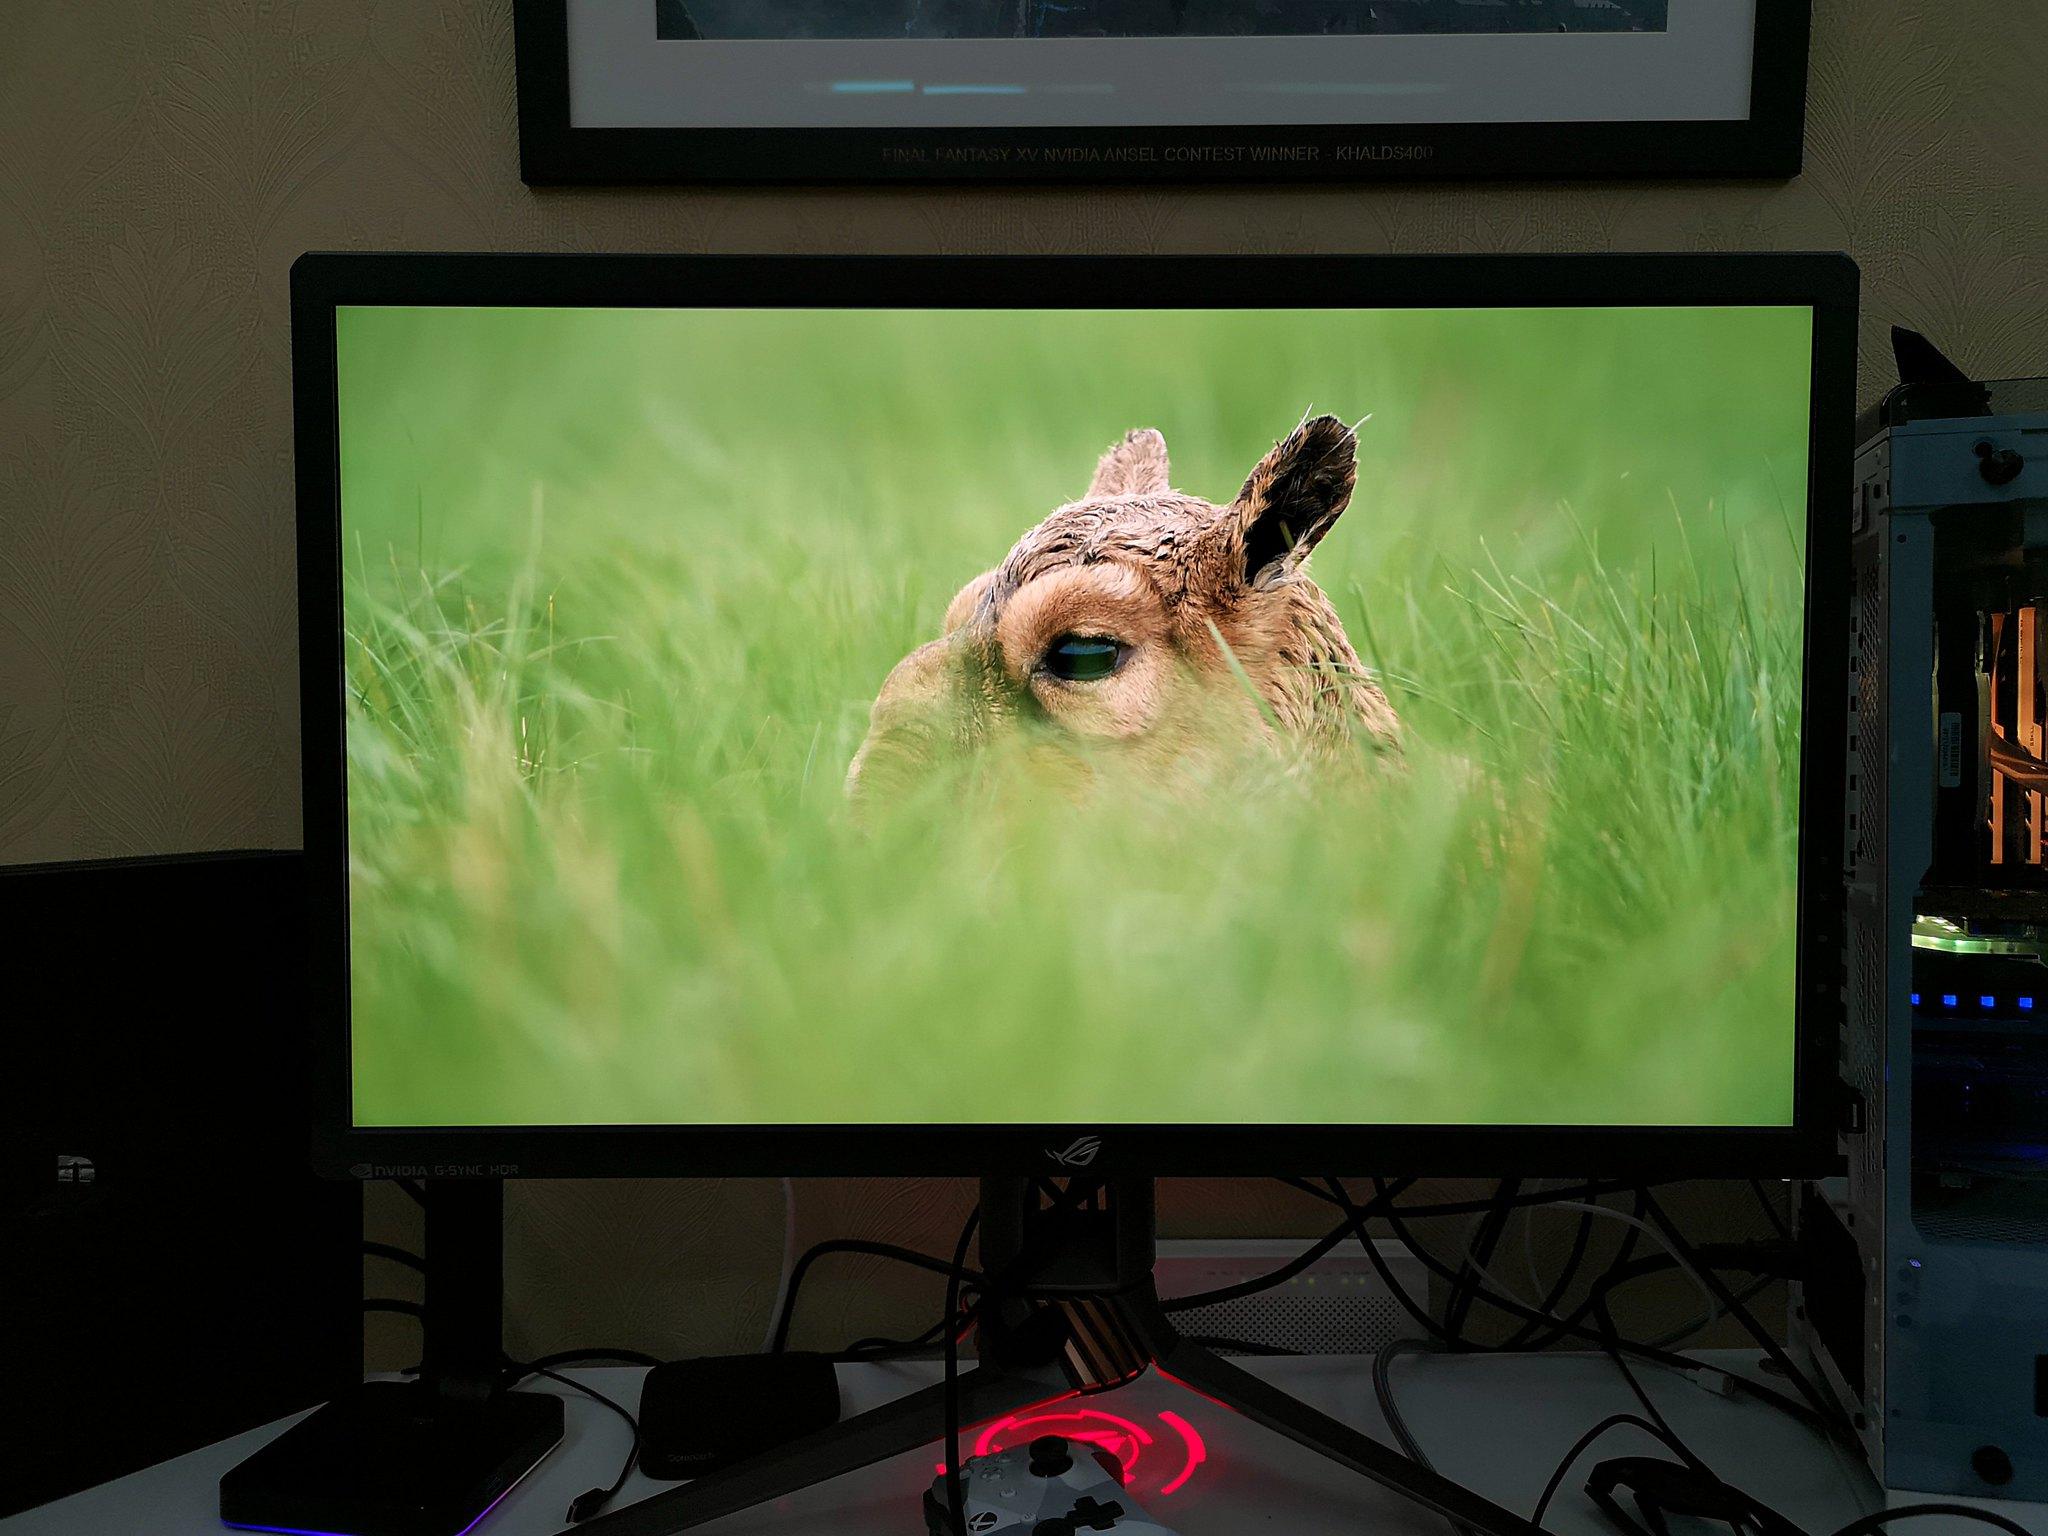 VC] ASUS announces Swift PG27UQ 4K IPS 144Hz G-Sync HDR monitor